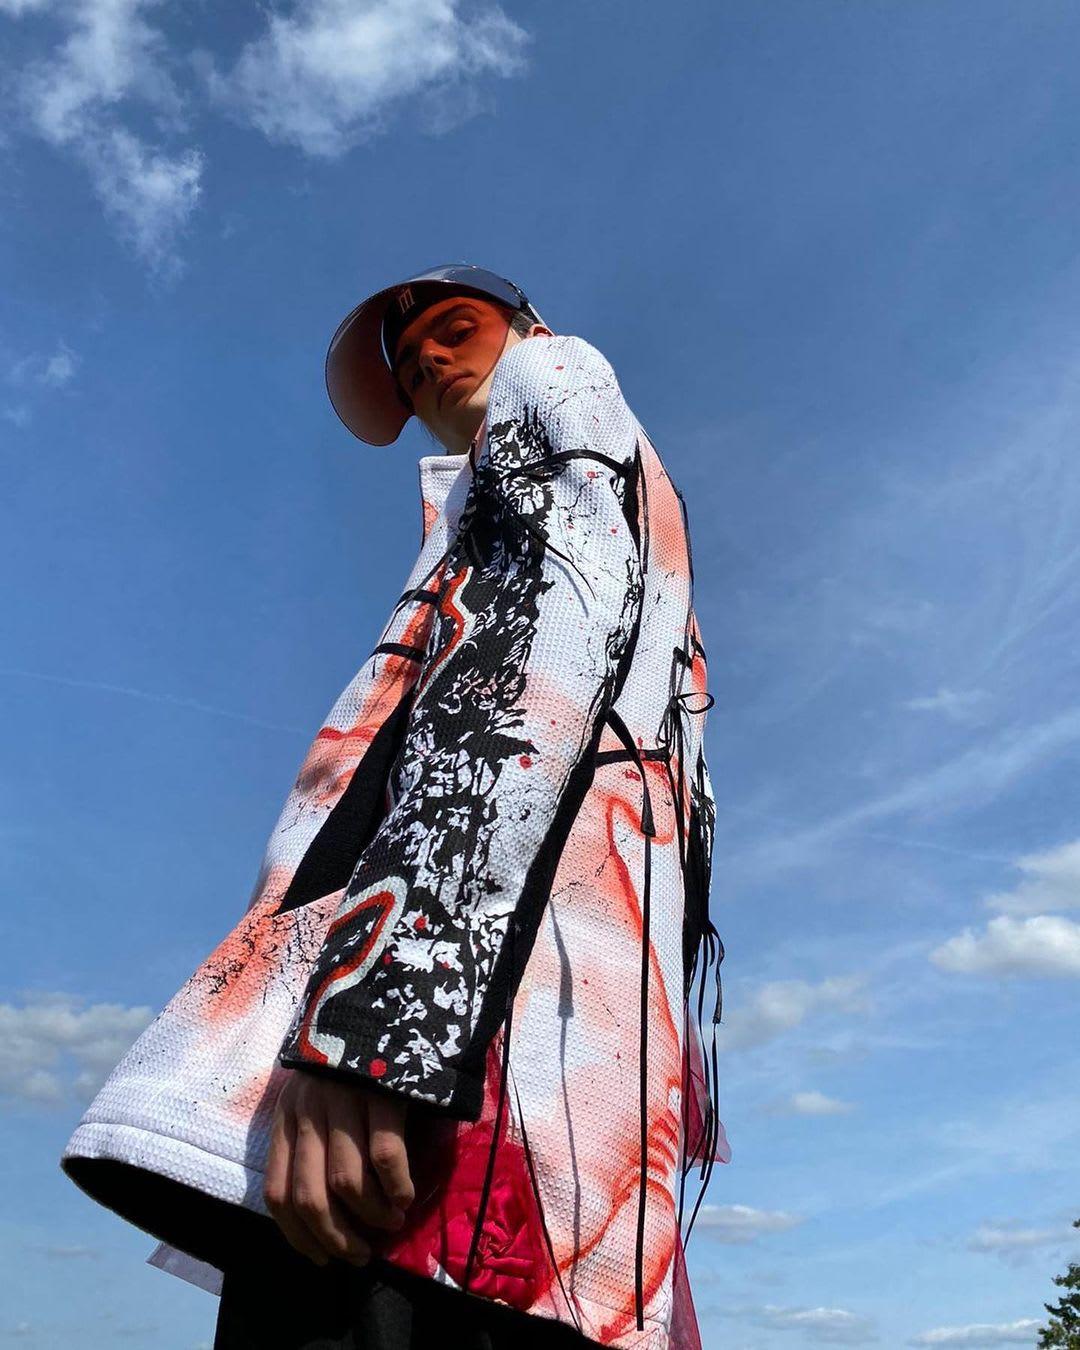 Sarah-Hollebon-2020-Photographer-Gabby-Sep-Model-George-Weait-2.jpg